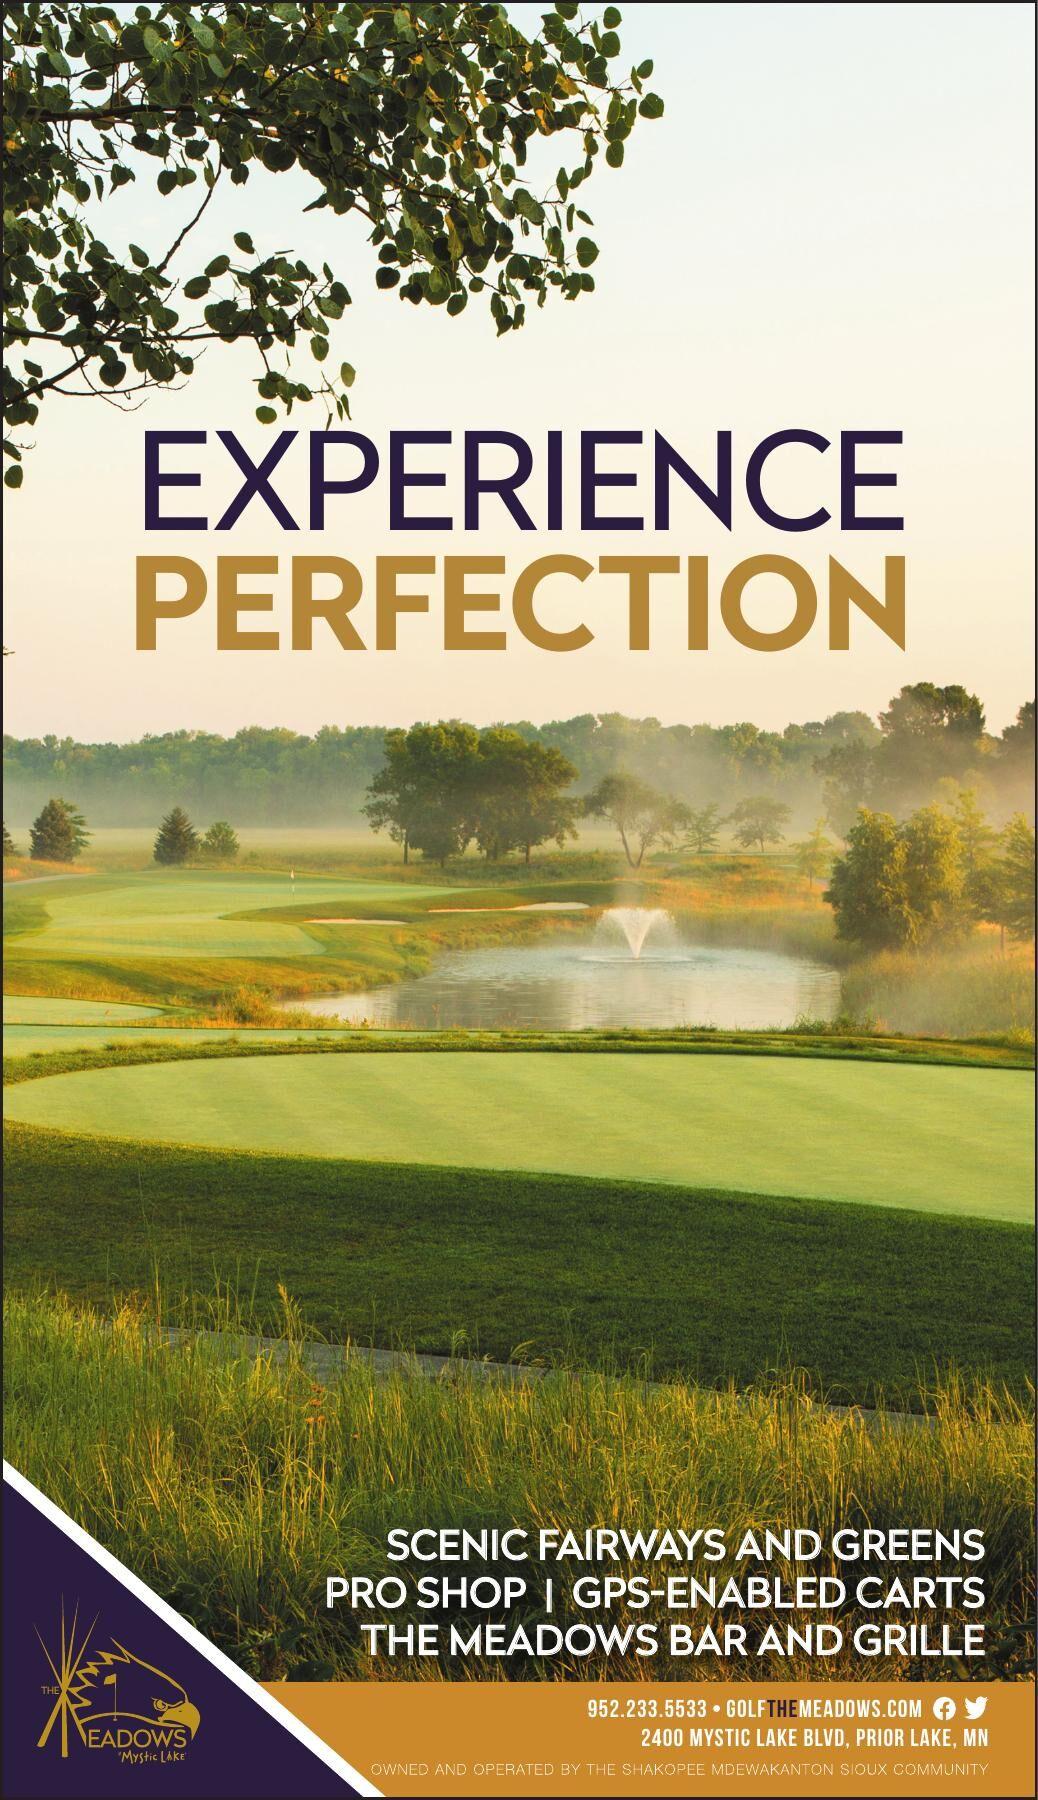 EXPERIENCE PERFECTION SCENIC FAIRWAYS